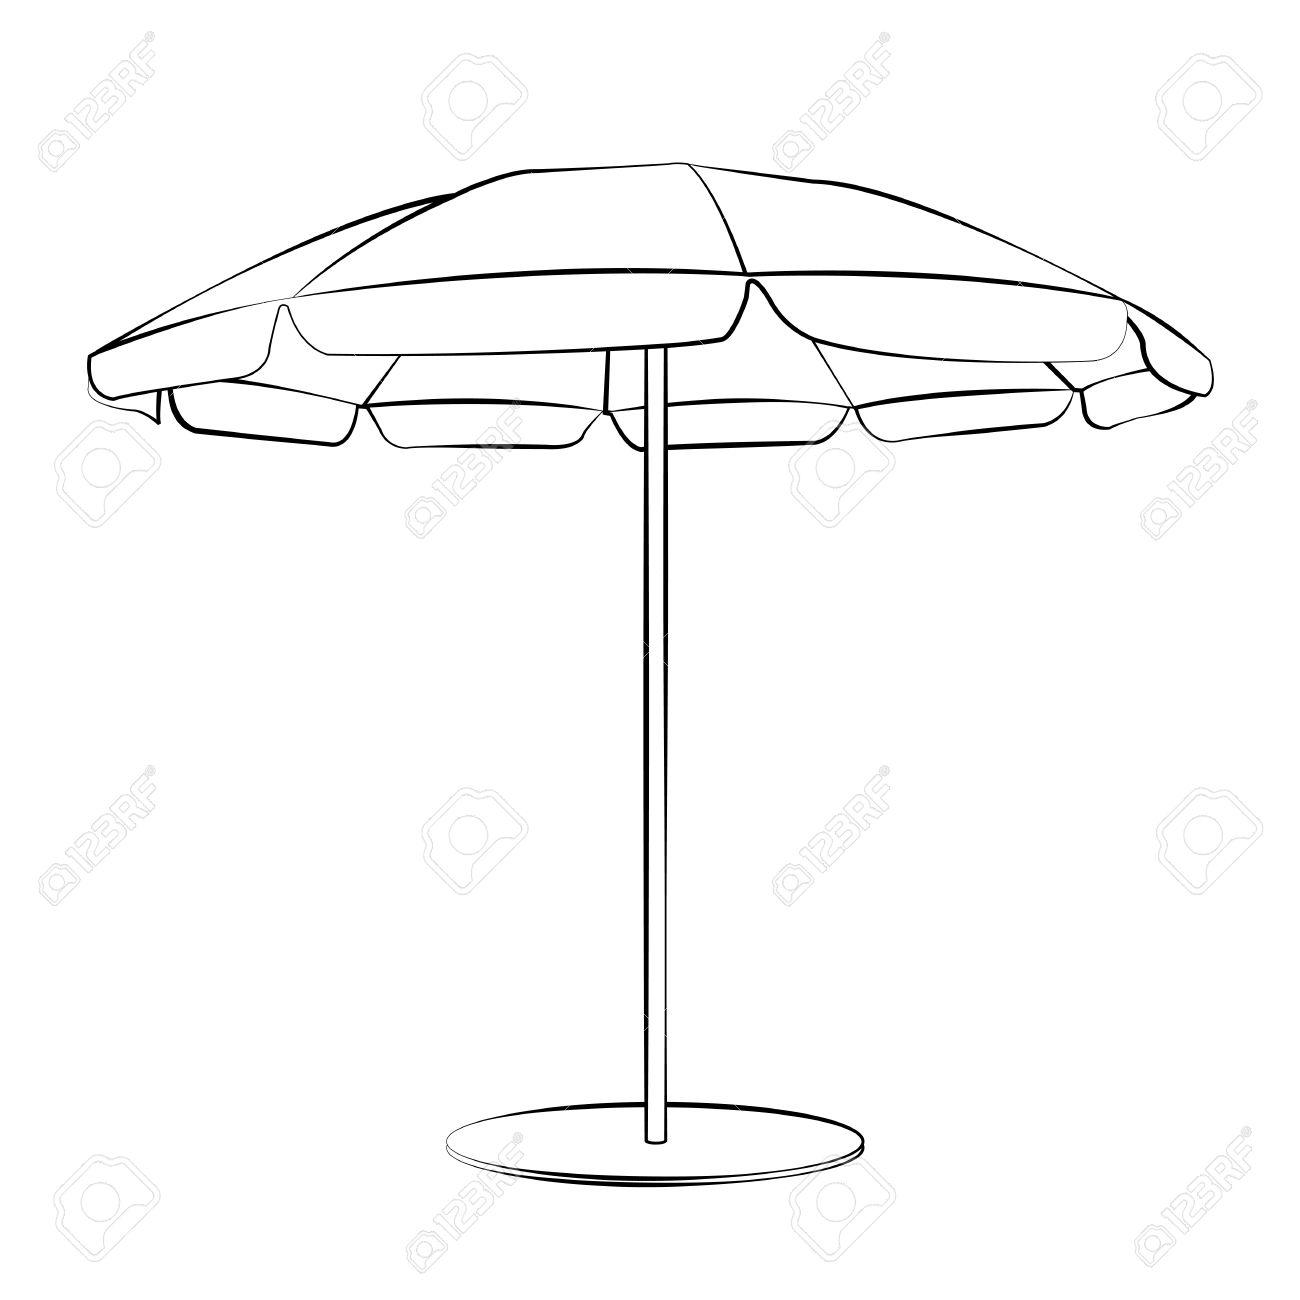 Beach umbrella clipart black and white 4 » Clipart Station.